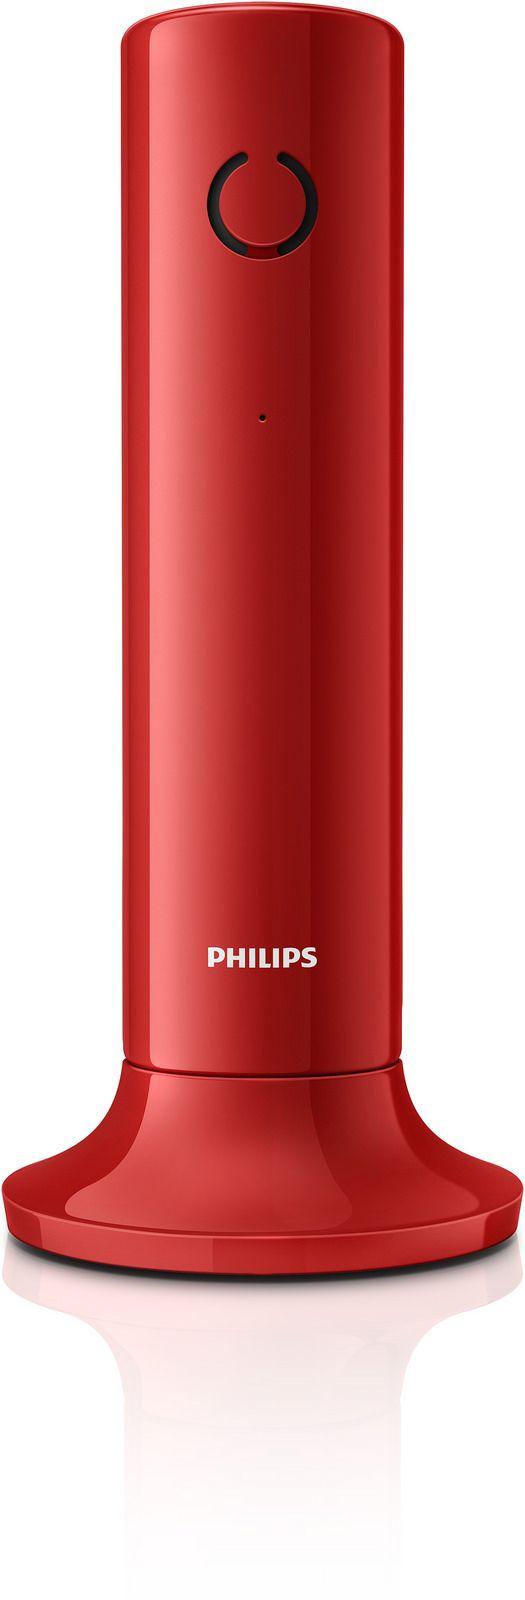 Philips Linea design cordless phone M3301R